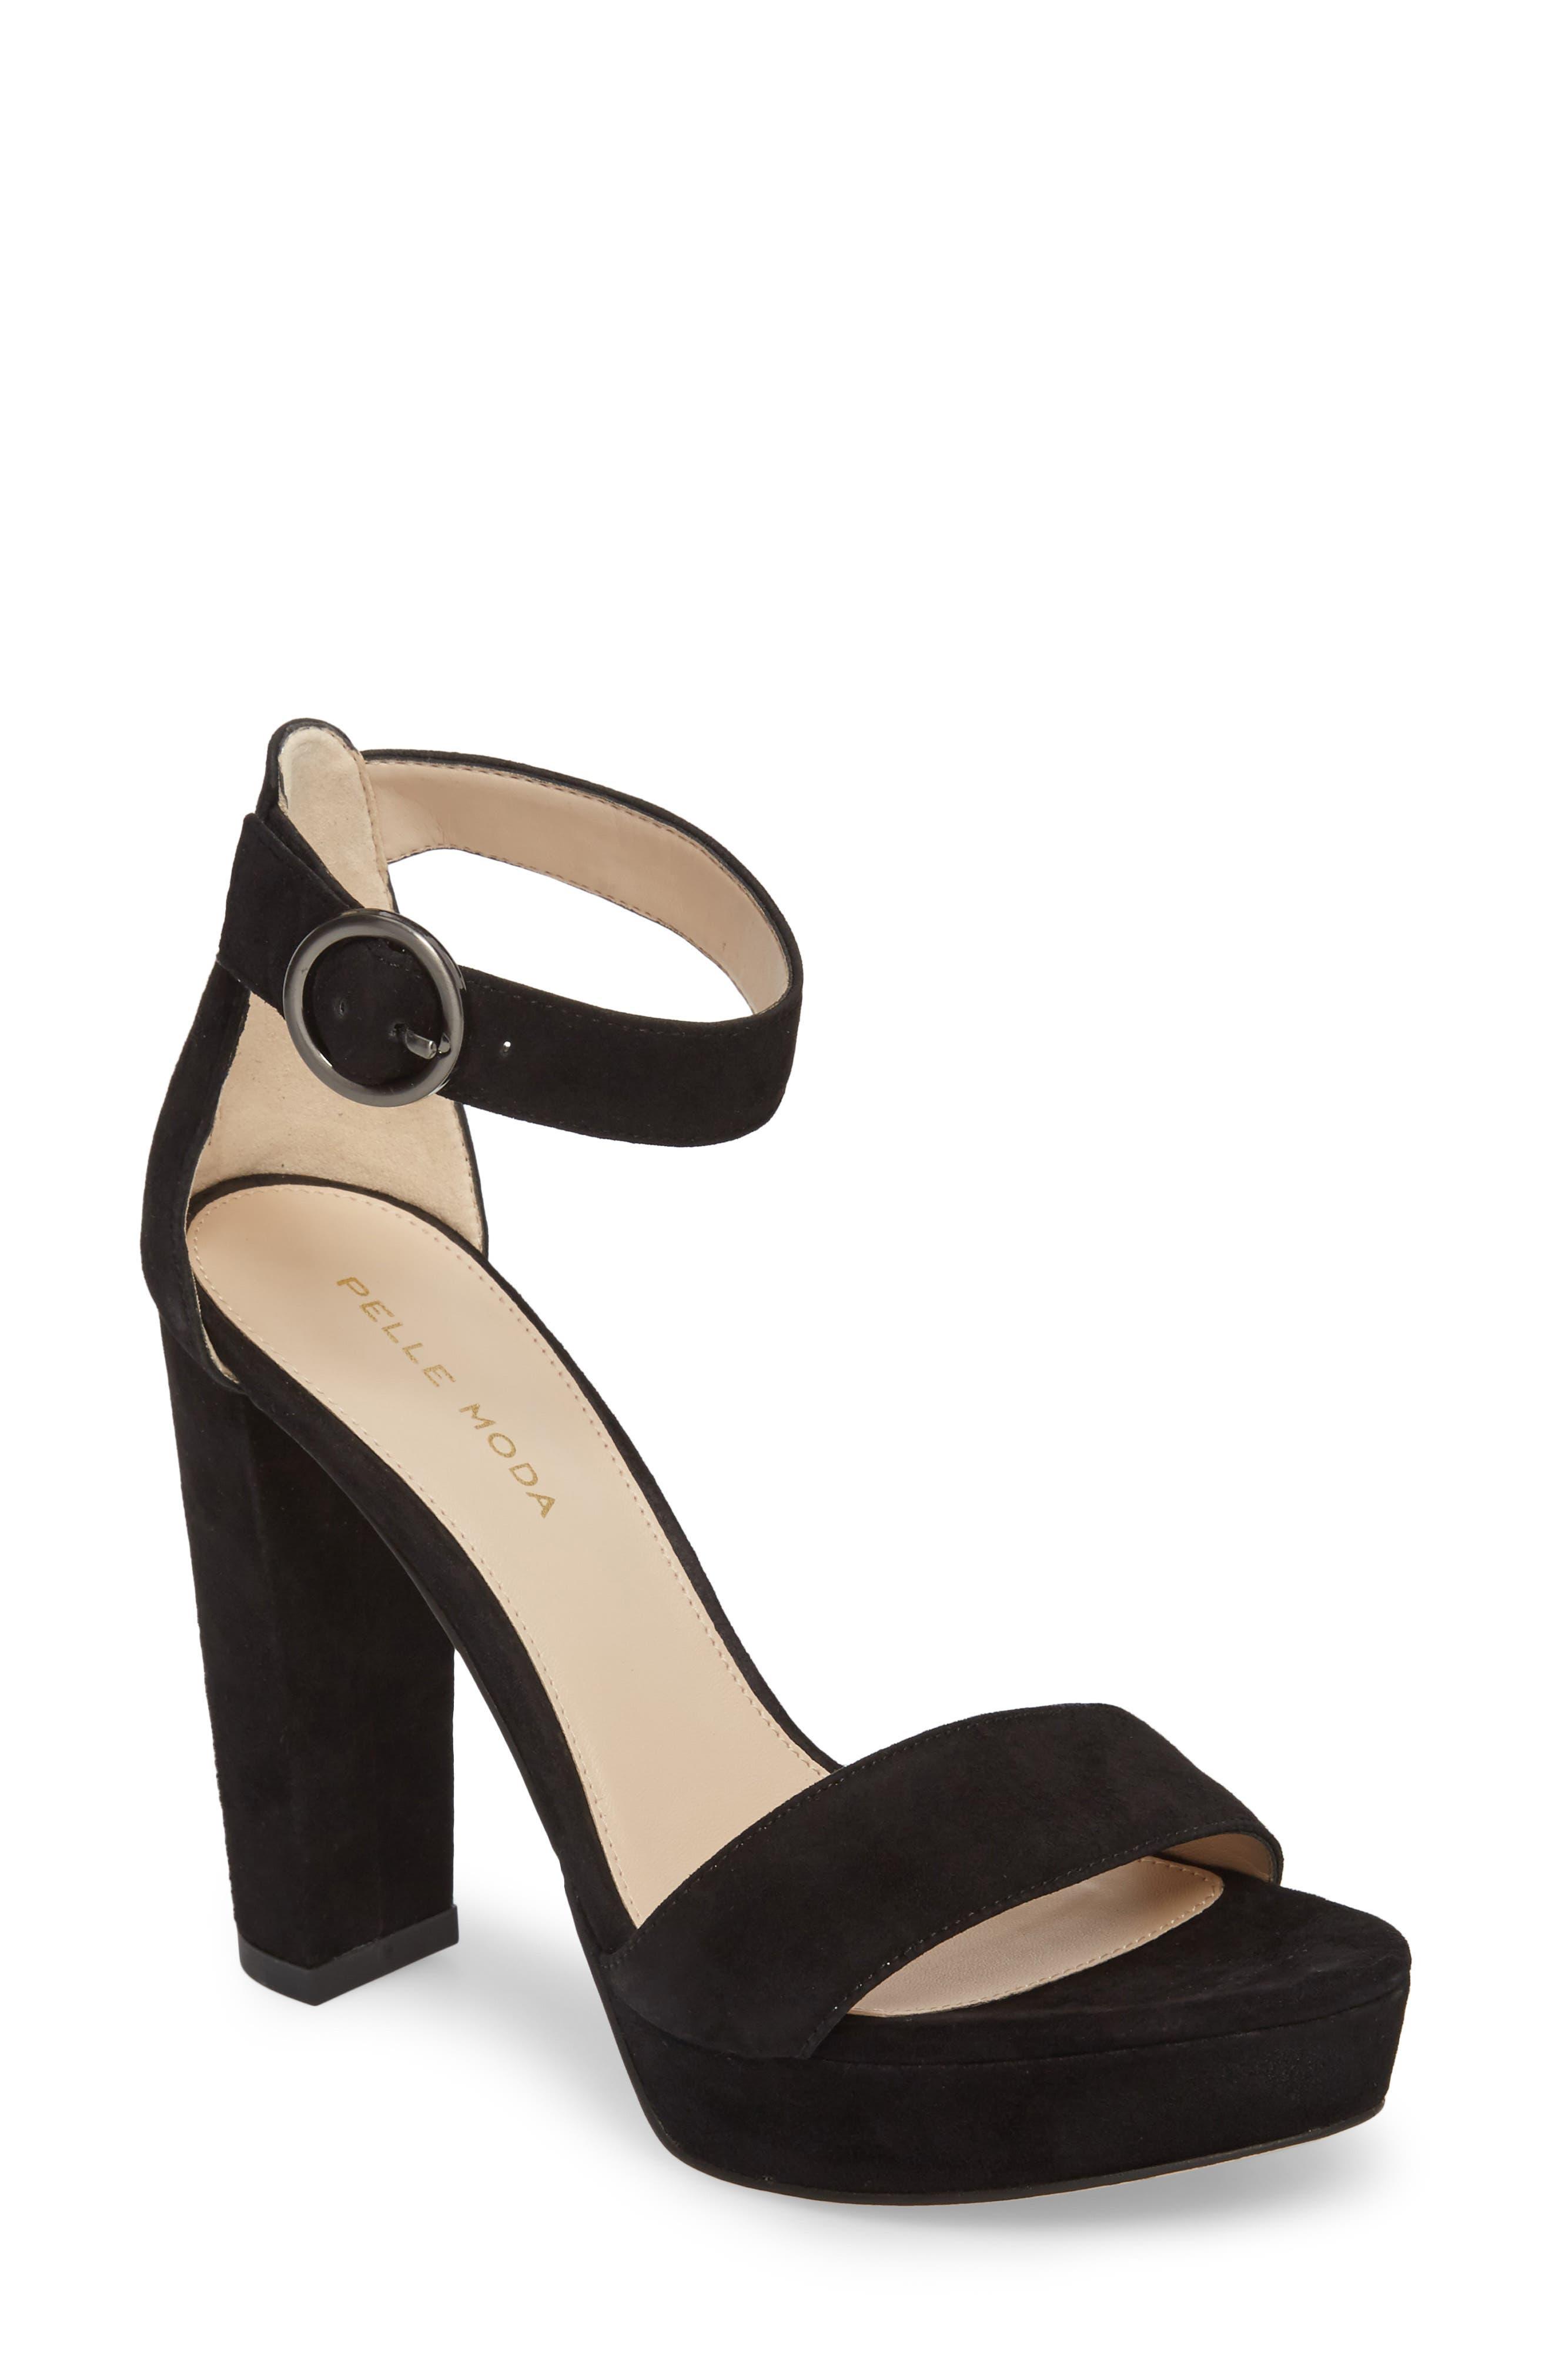 Palo 2 Platform Sandal,                         Main,                         color, Black Suede